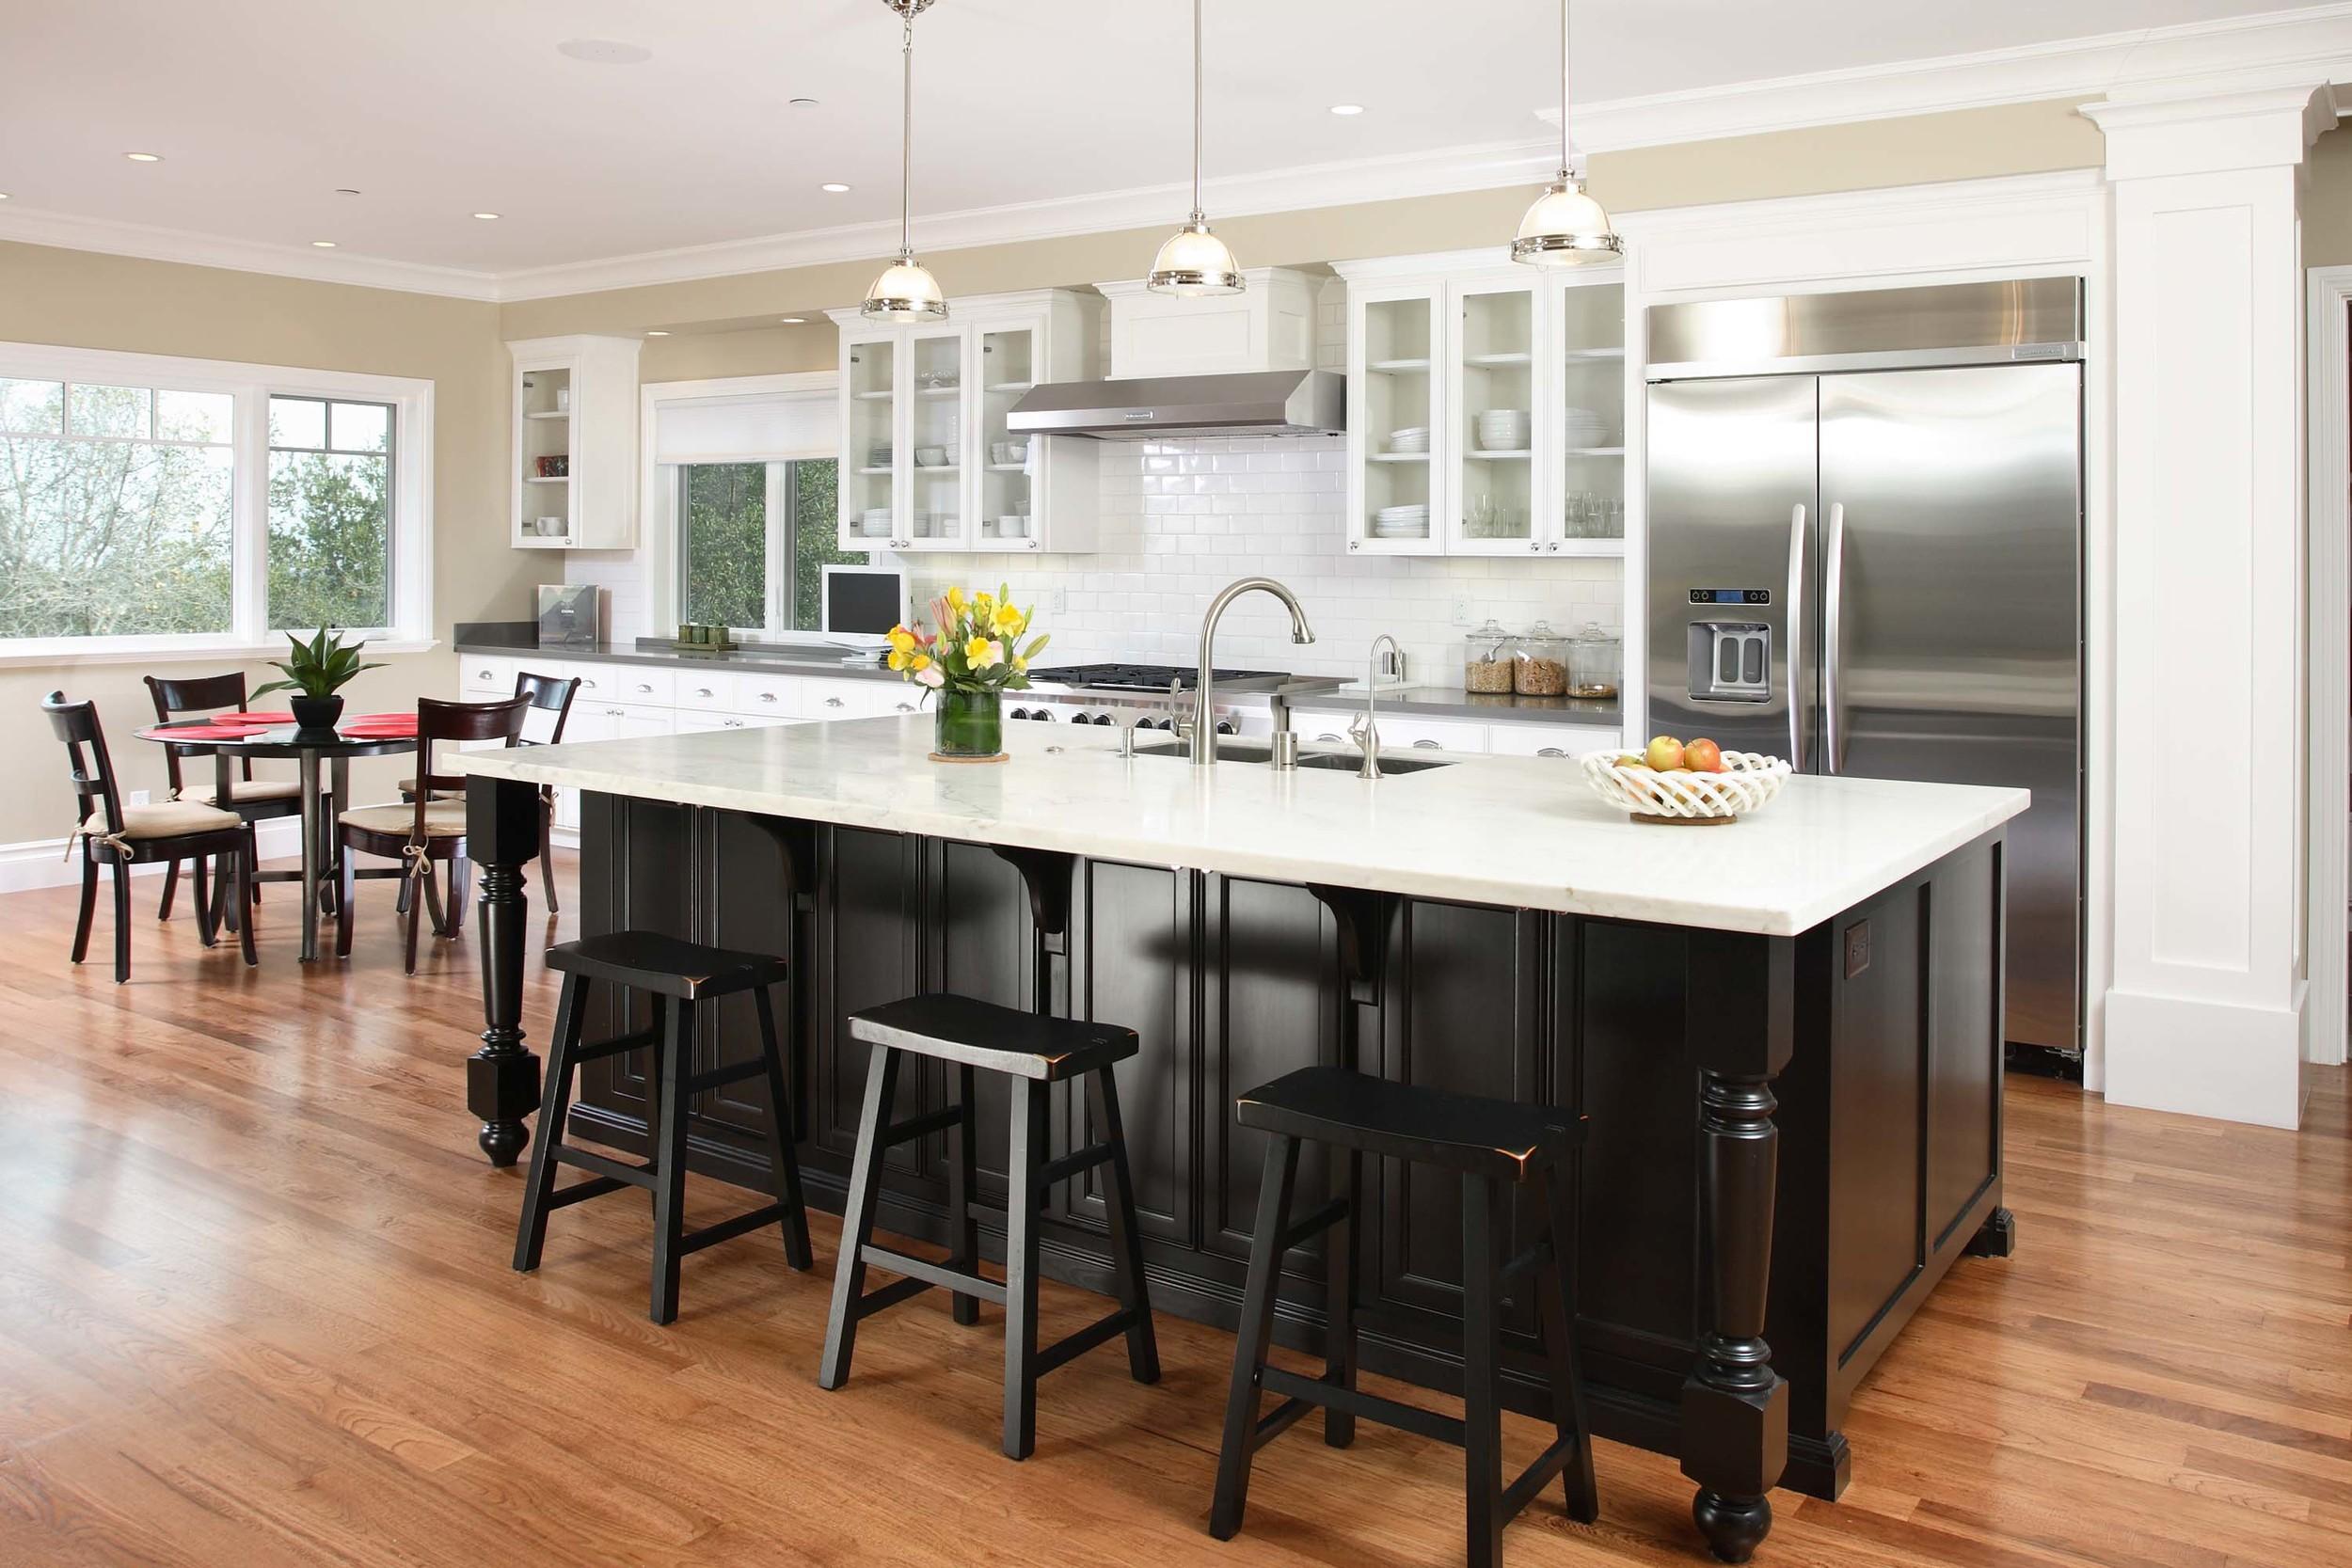 501 VV kitchen 1 email.jpg